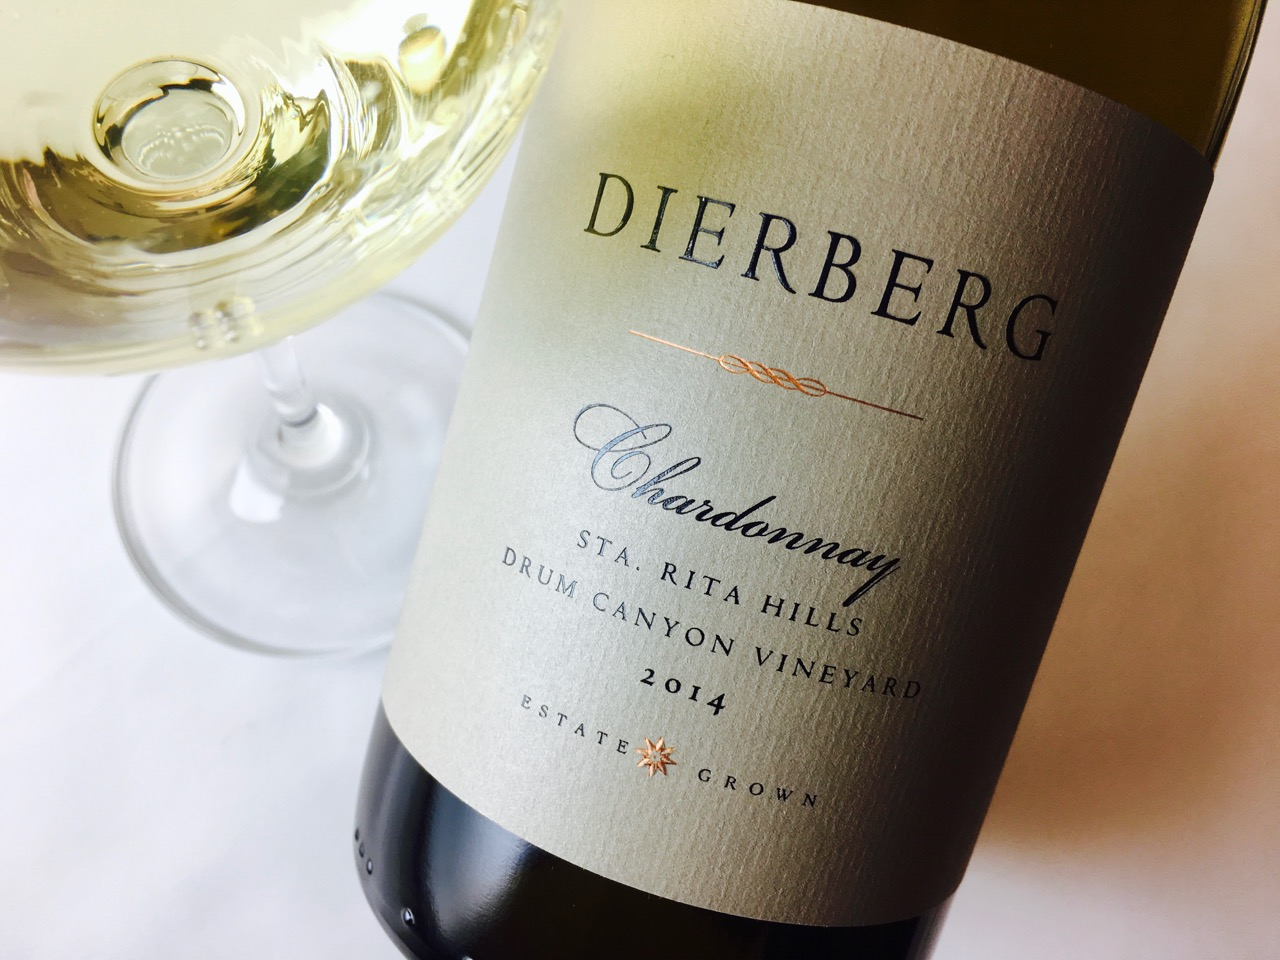 2014 Dierberg Chardonnay Drum Canyon Vineyard Sta. Rita Hills